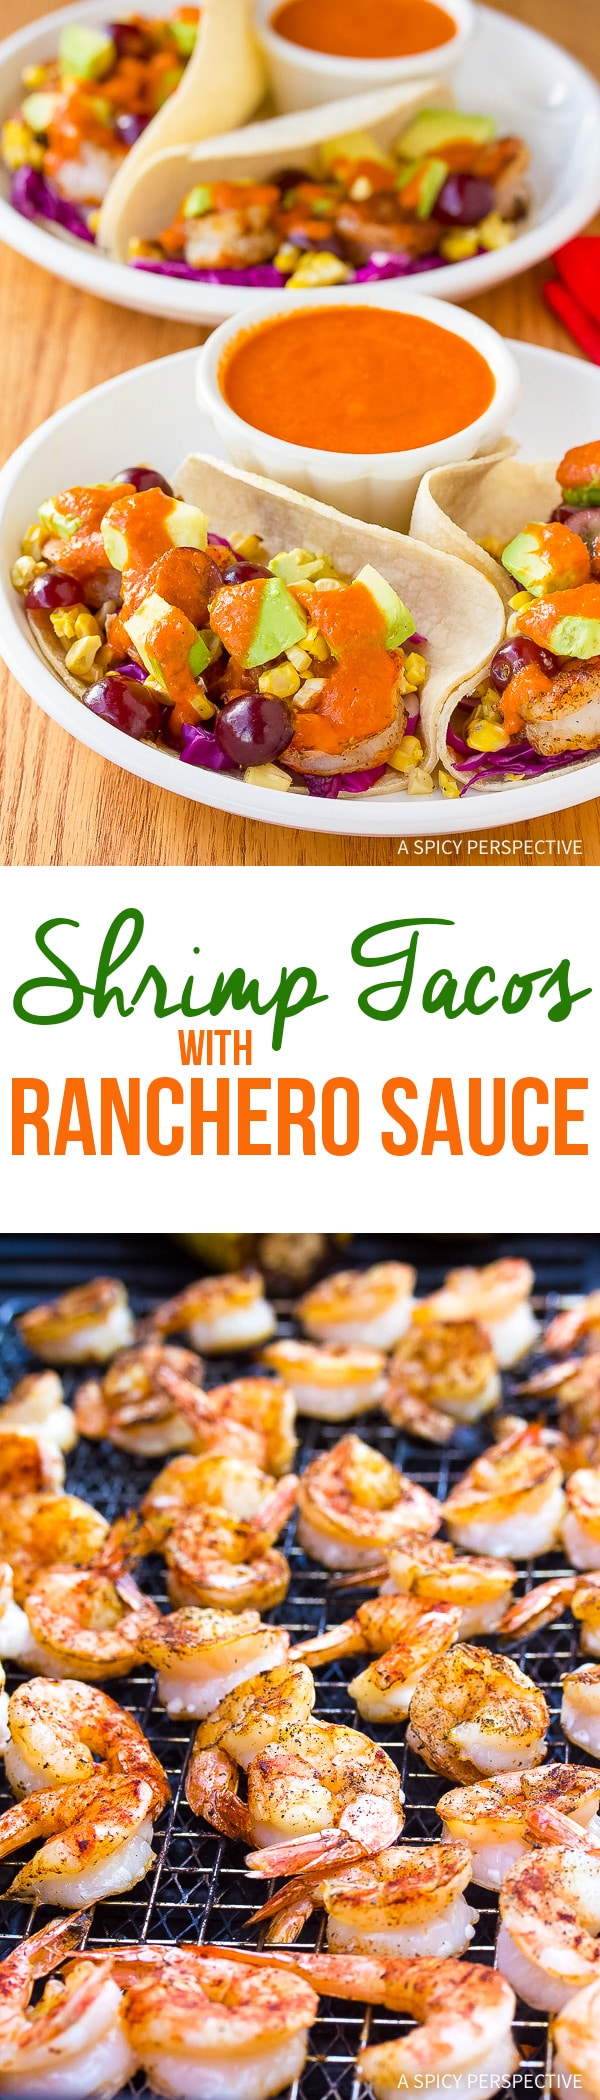 Zesty Shrimp Tacos Recipe with Ranchero Sauce